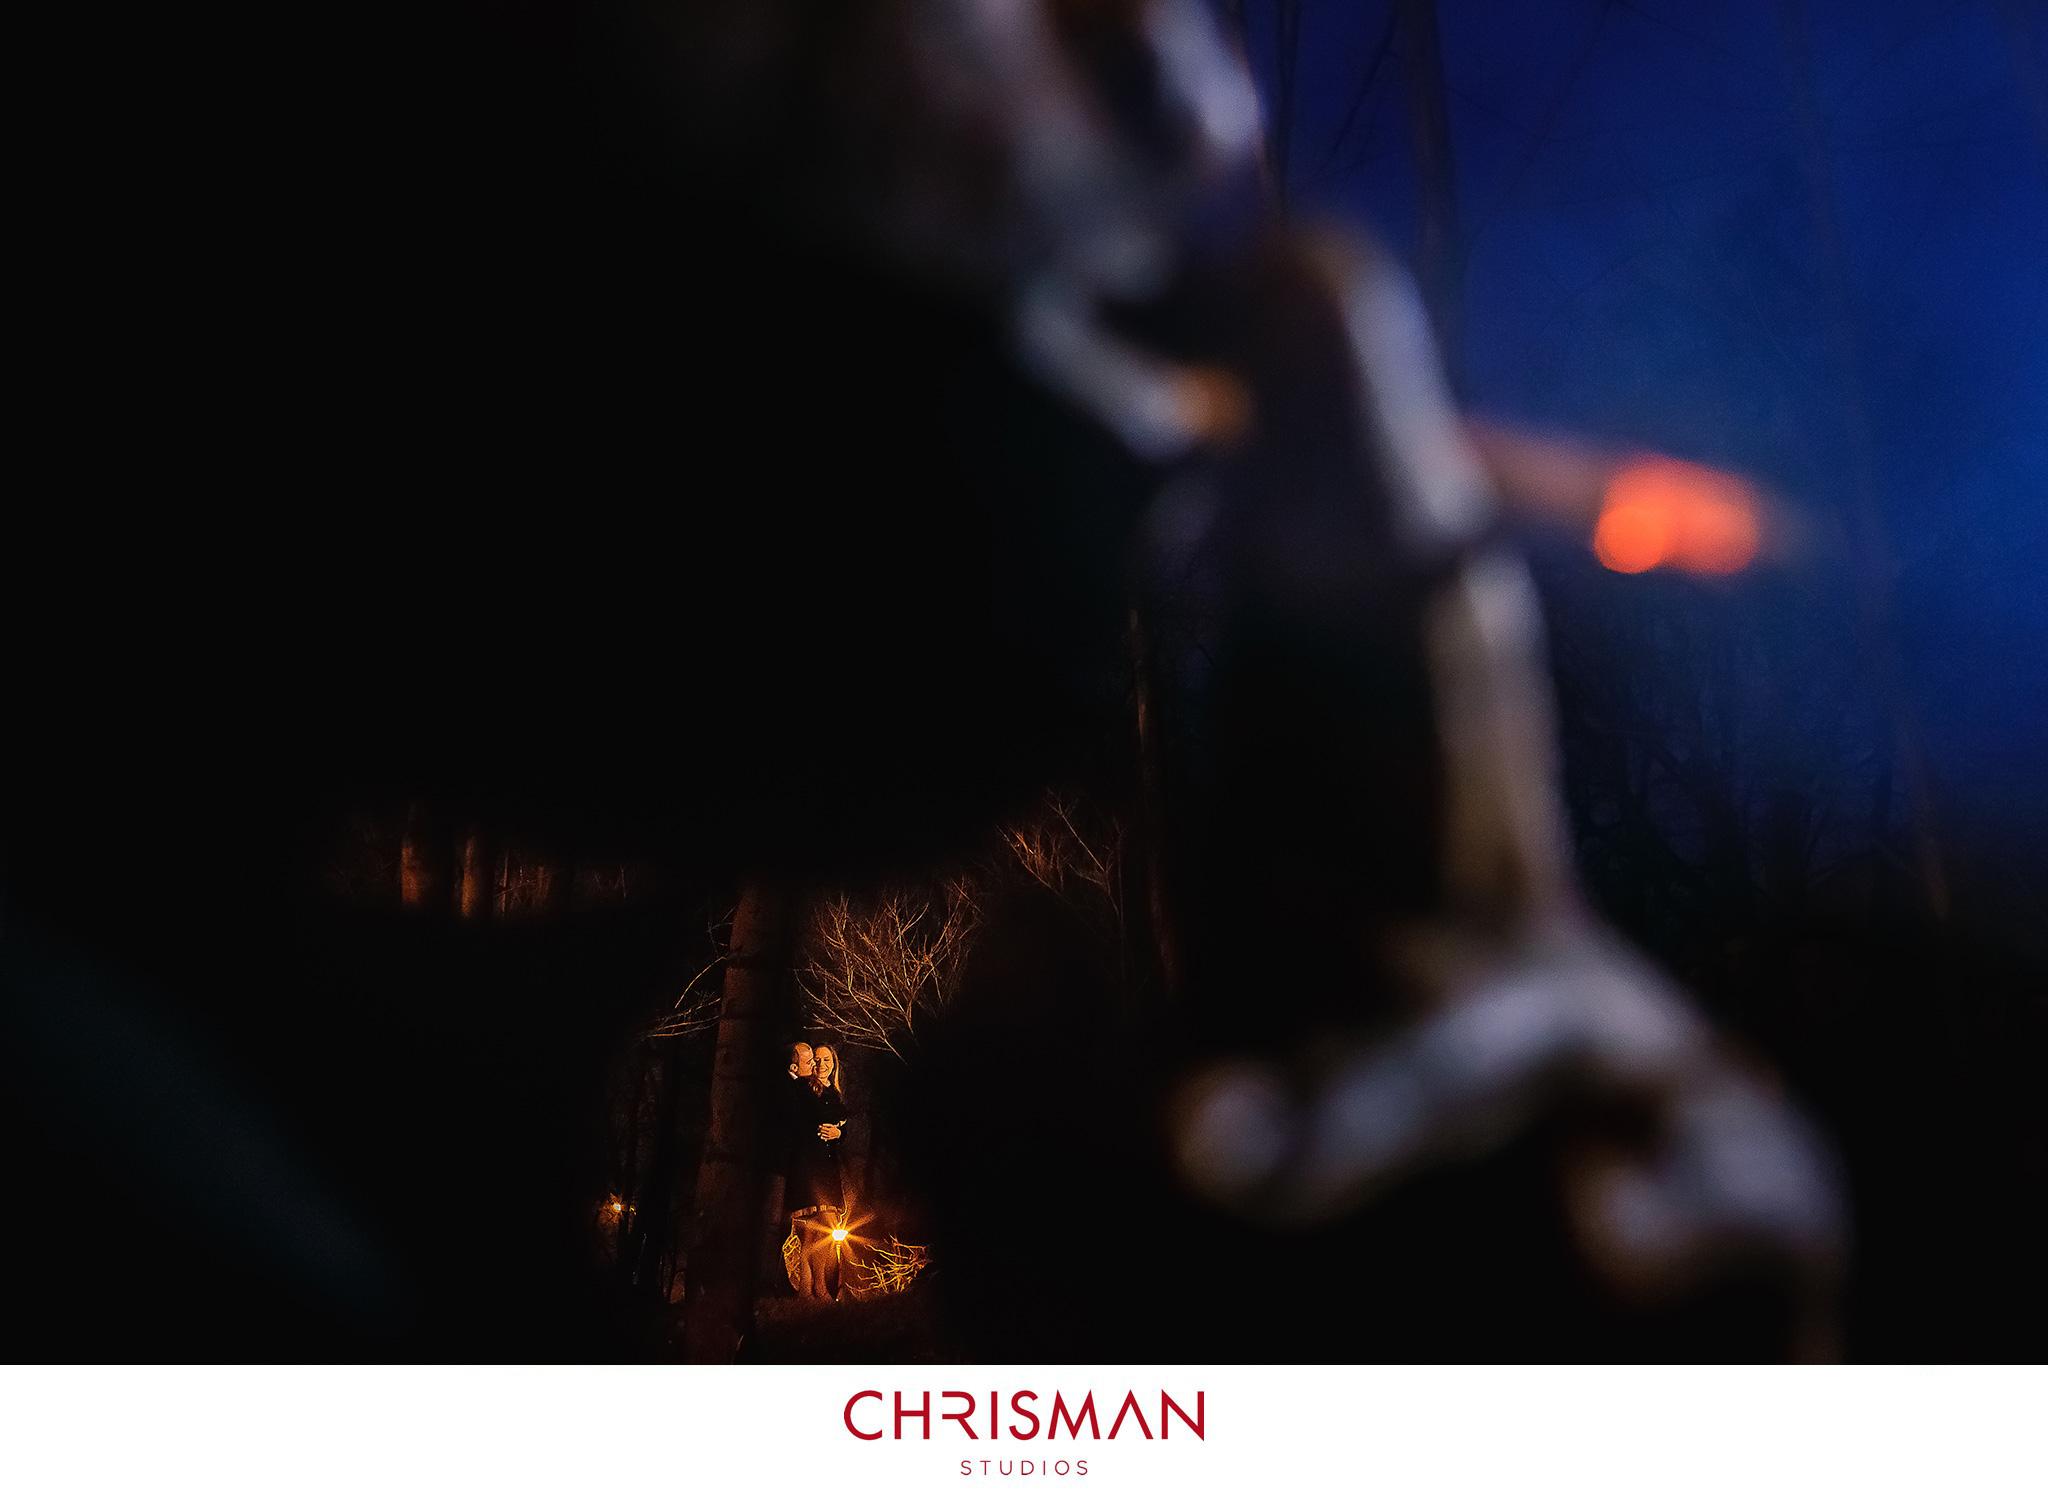 chrisman studios 04